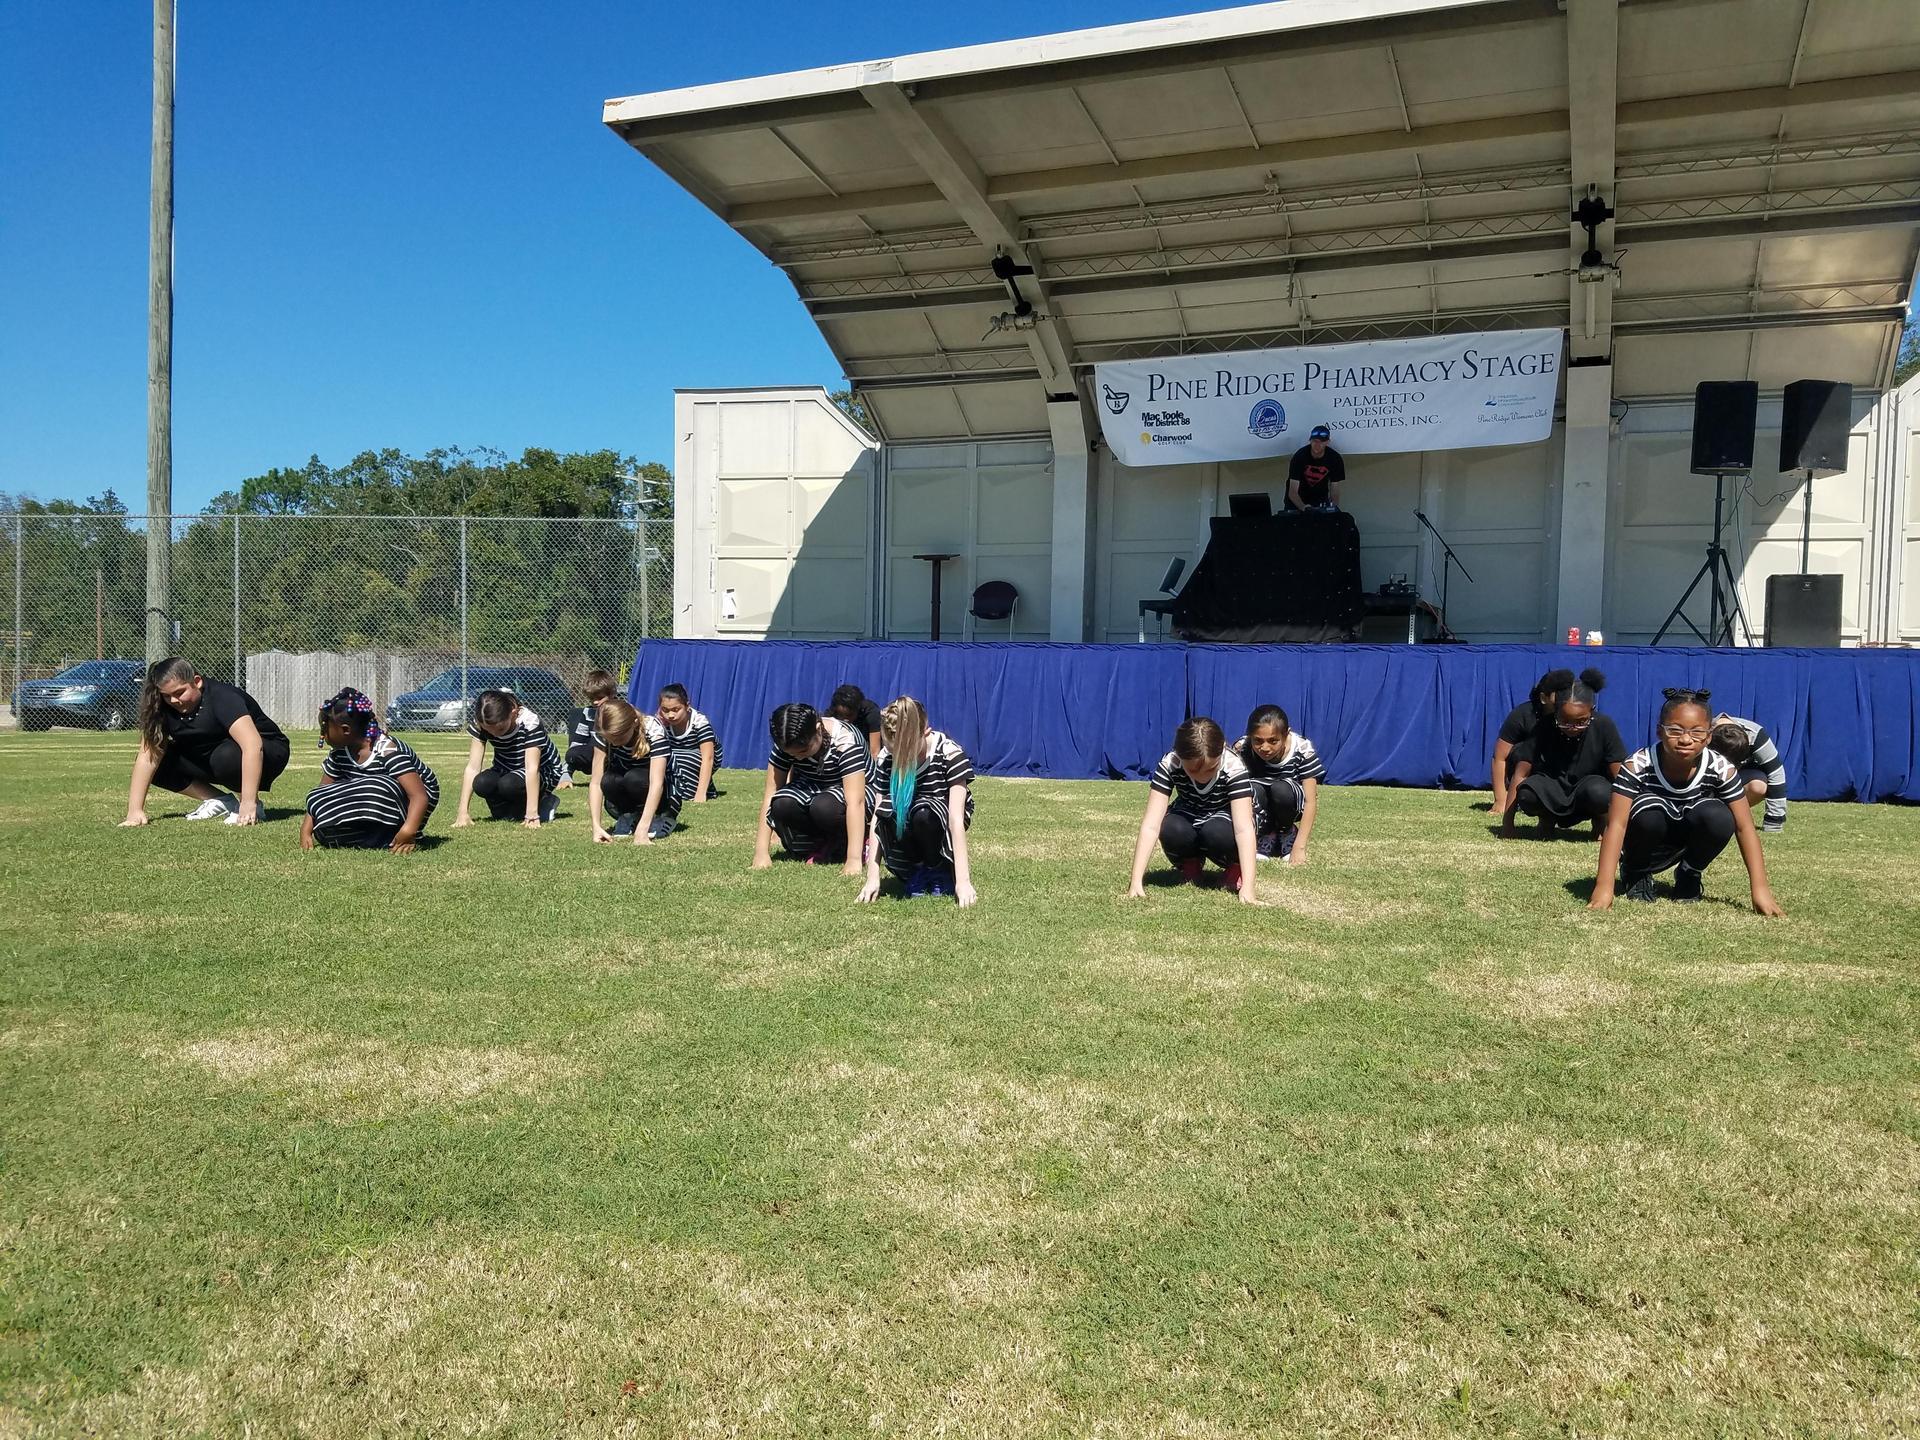 Pine Ridge Festival